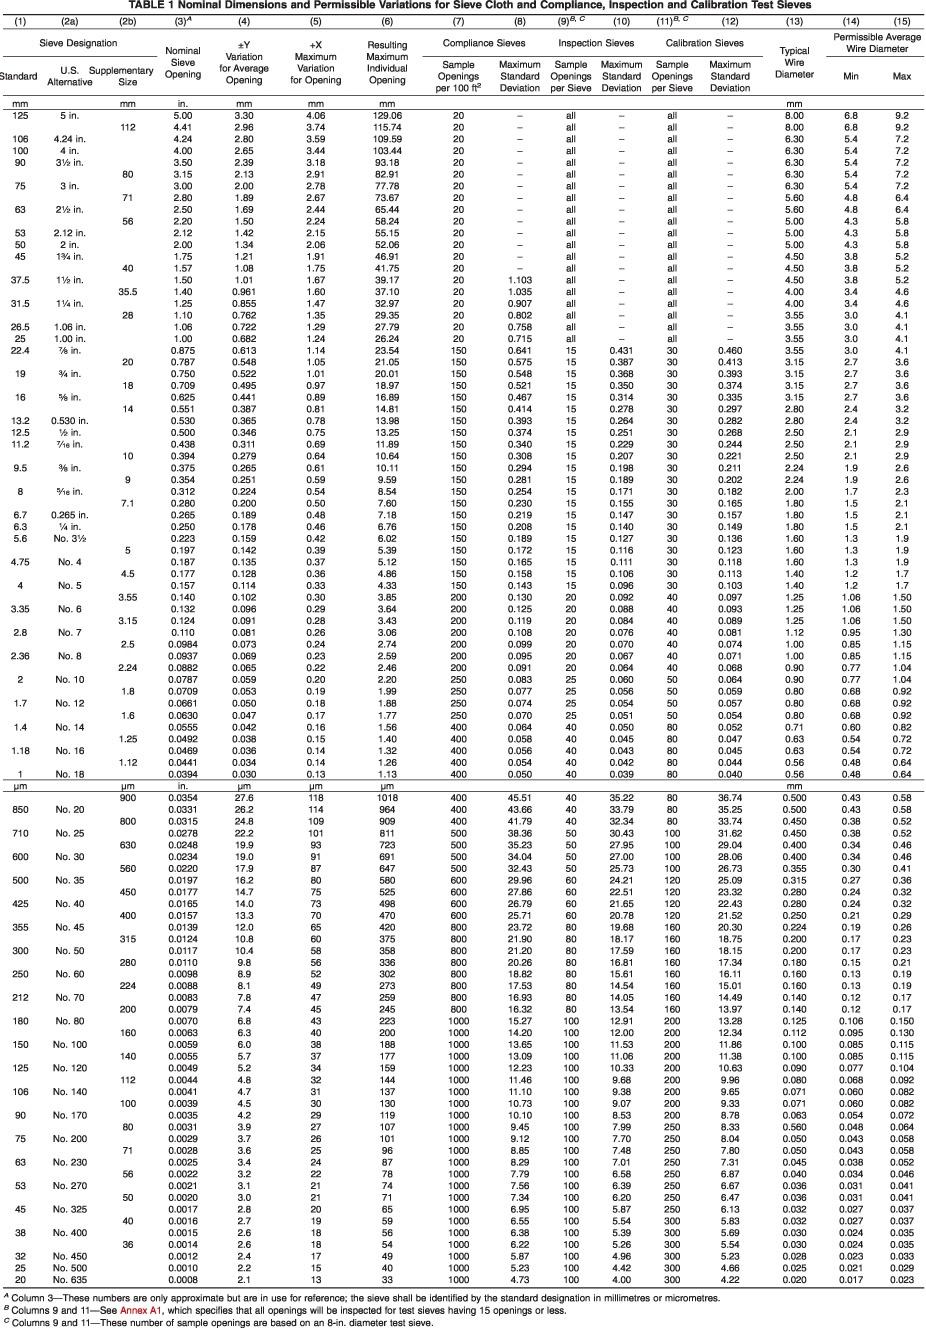 Nominal Dimensions ASTM-E11-17